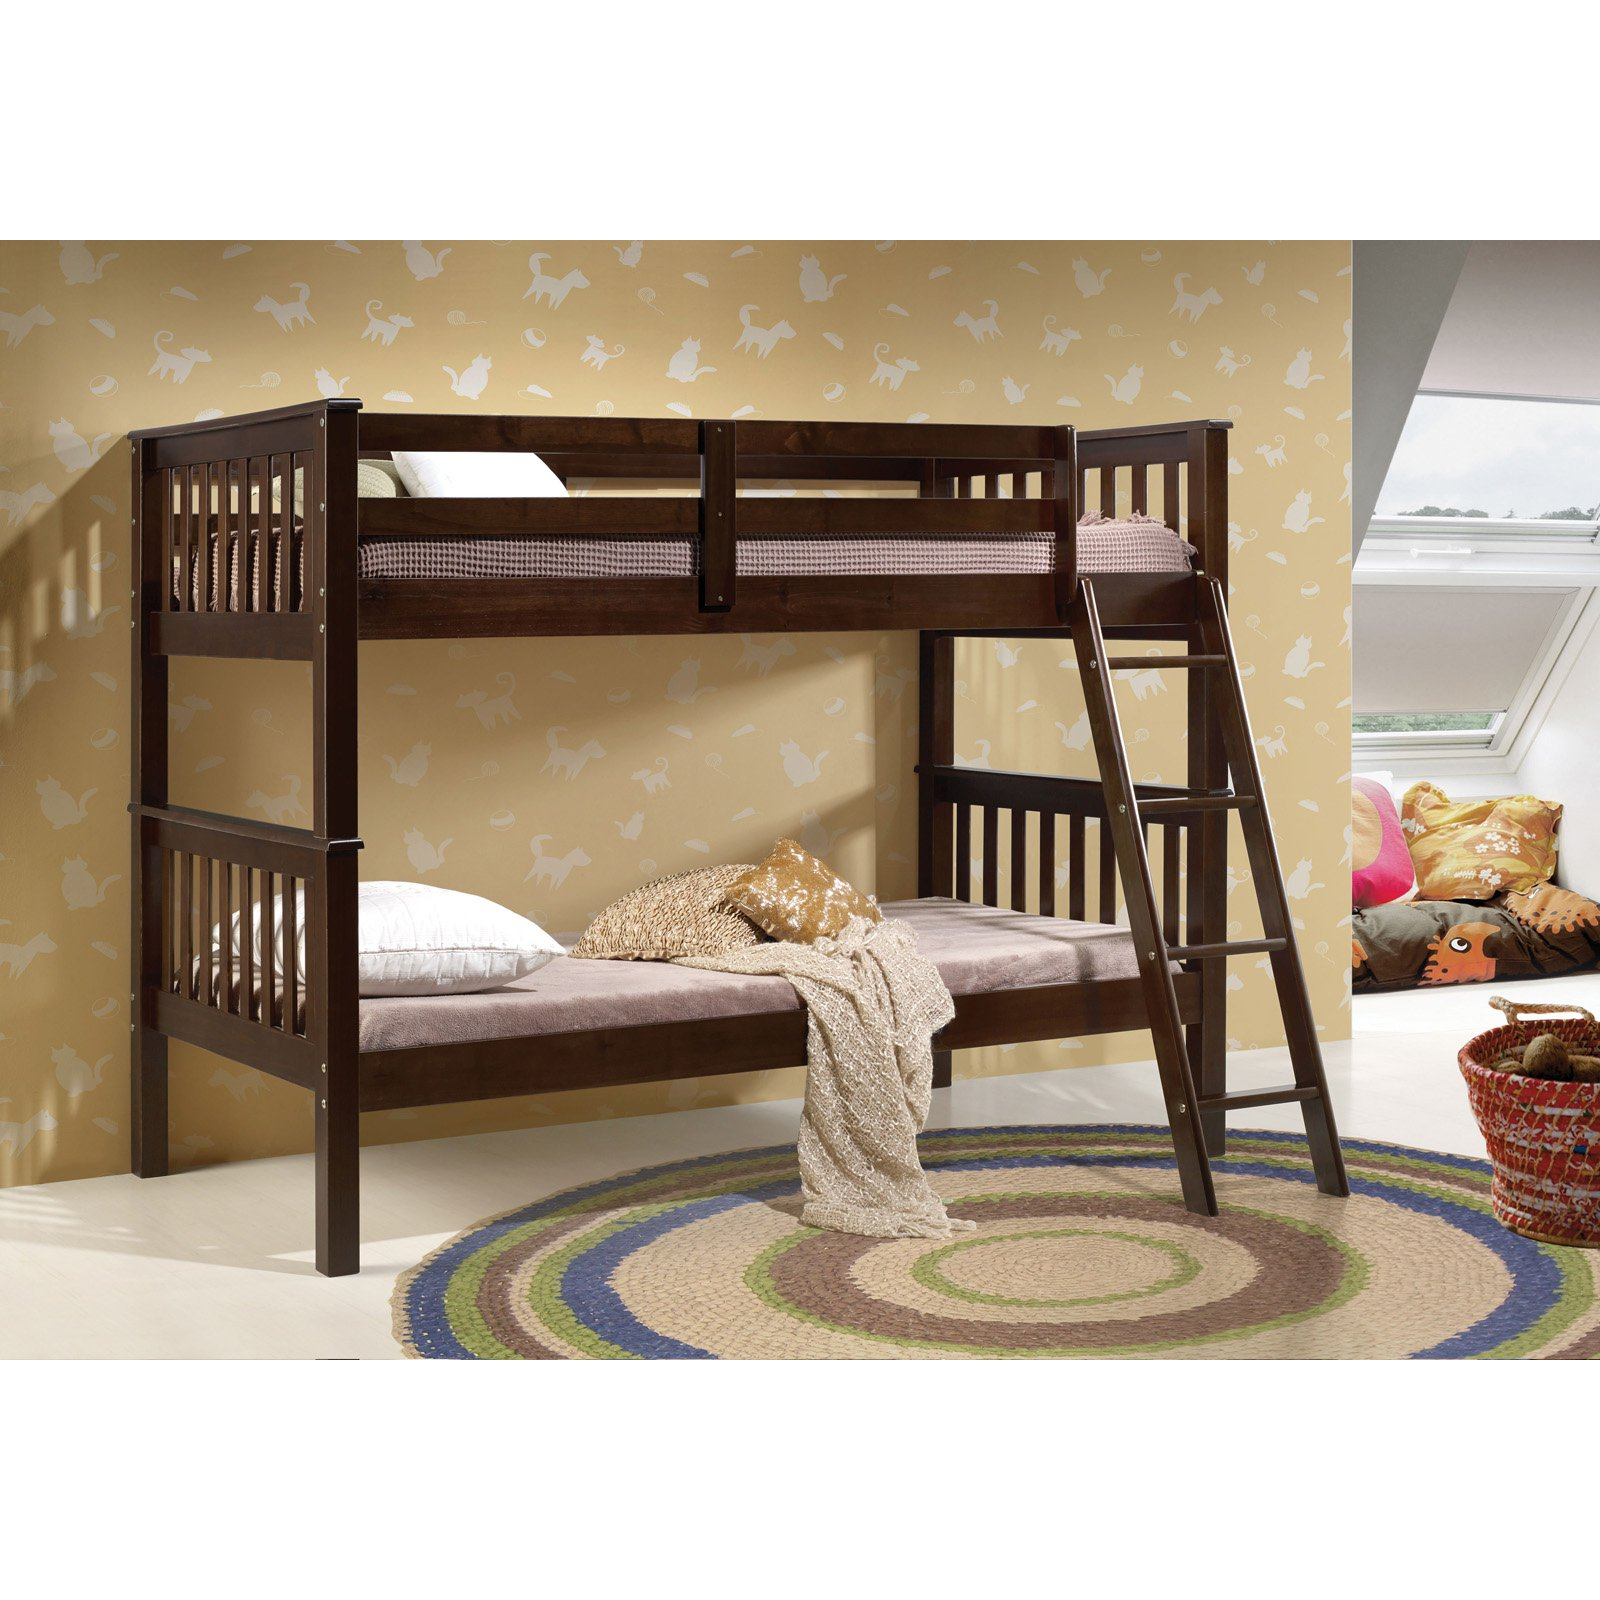 Acme Furniture Searra Twin Over Twin Bunk Bed Espresso by Acme Furniture